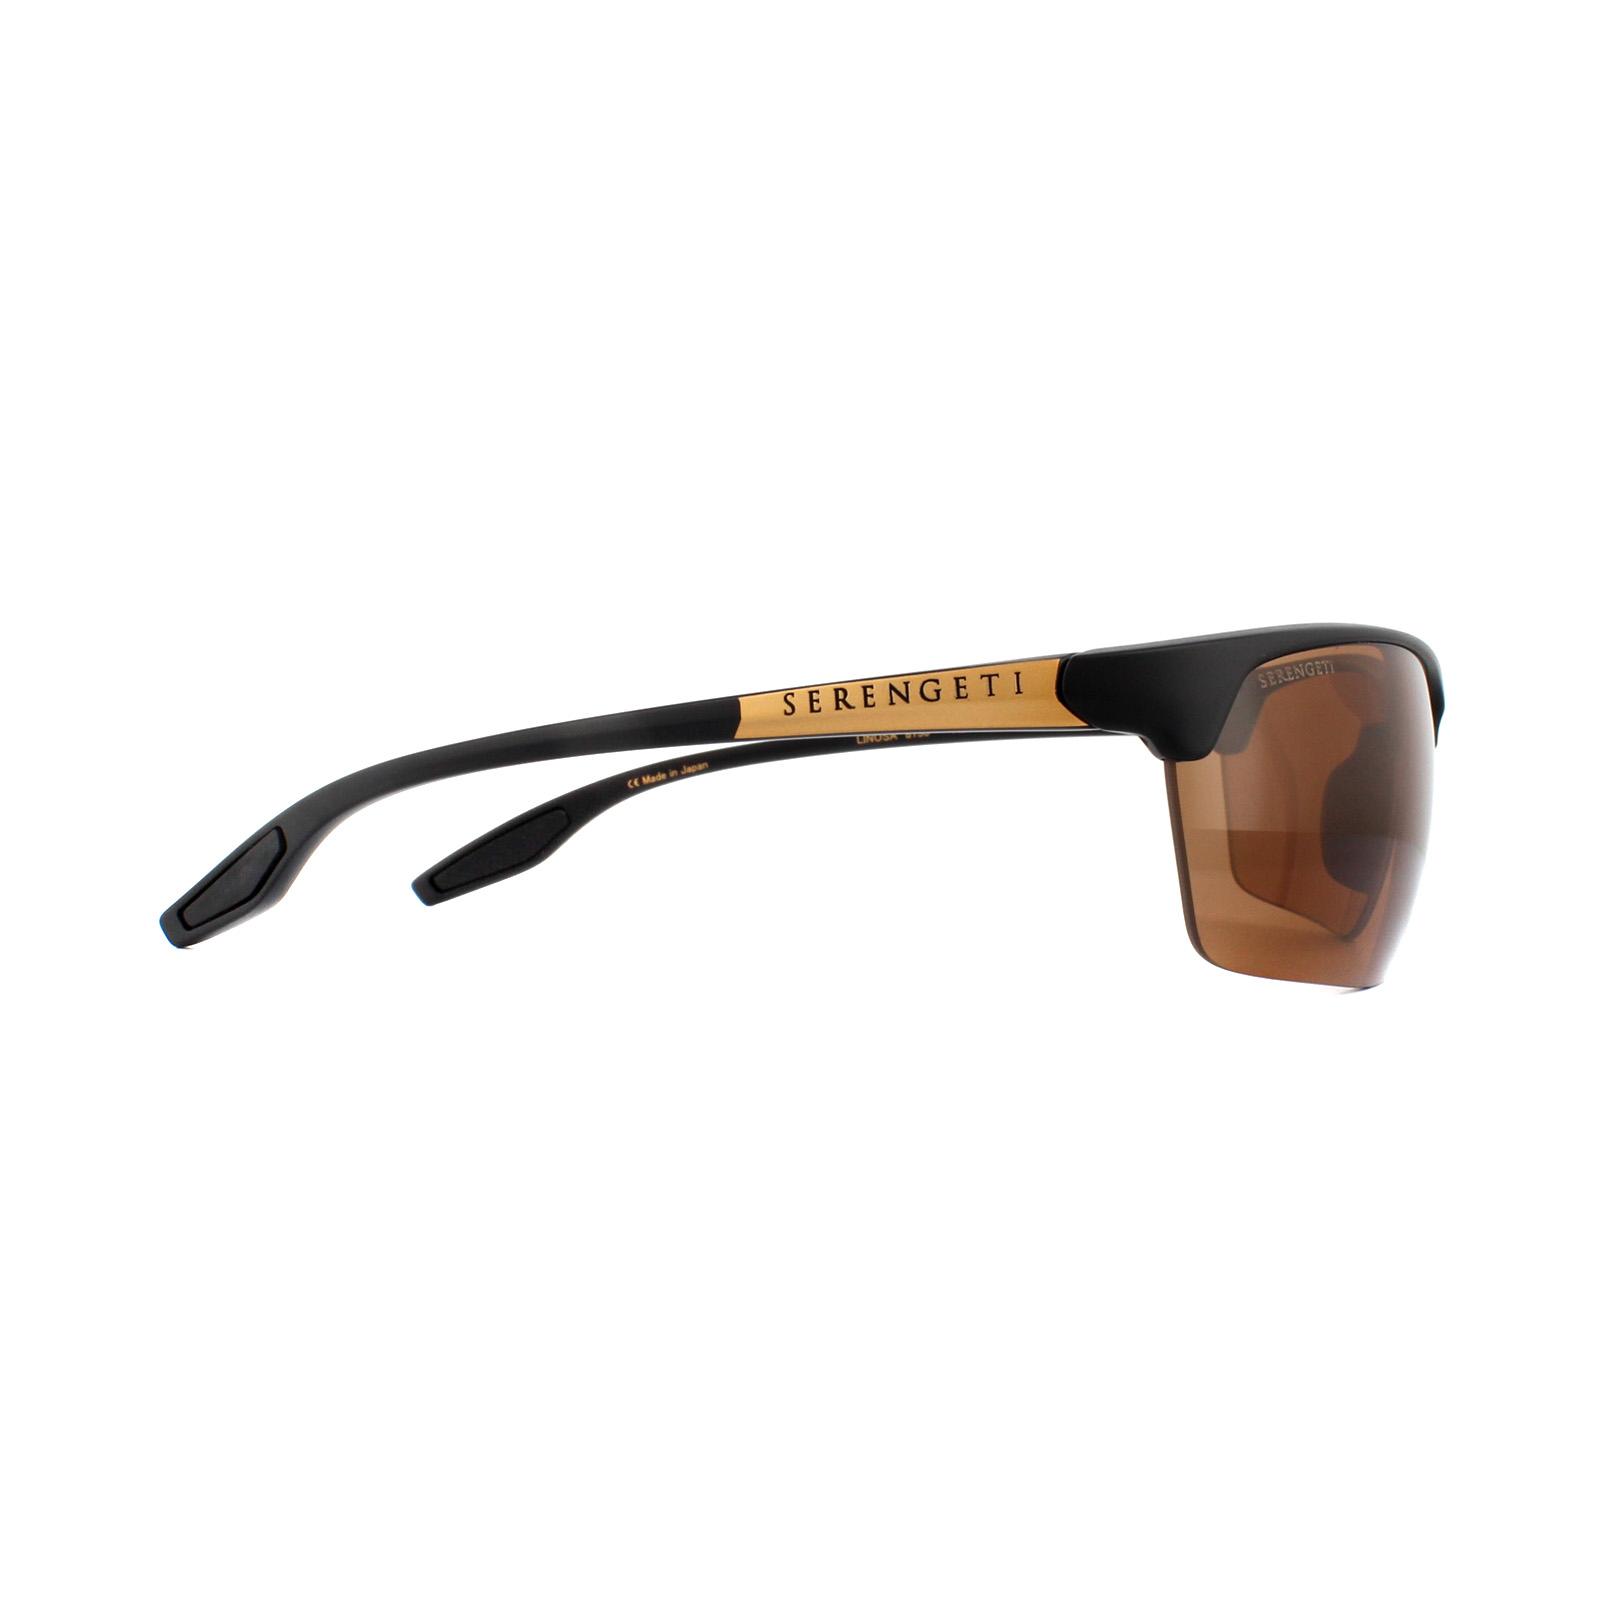 41145eb55e Sentinel Serengeti Sunglasses Linosa 8750 Satin Black Gold PhD Drivers  Brown Polarized